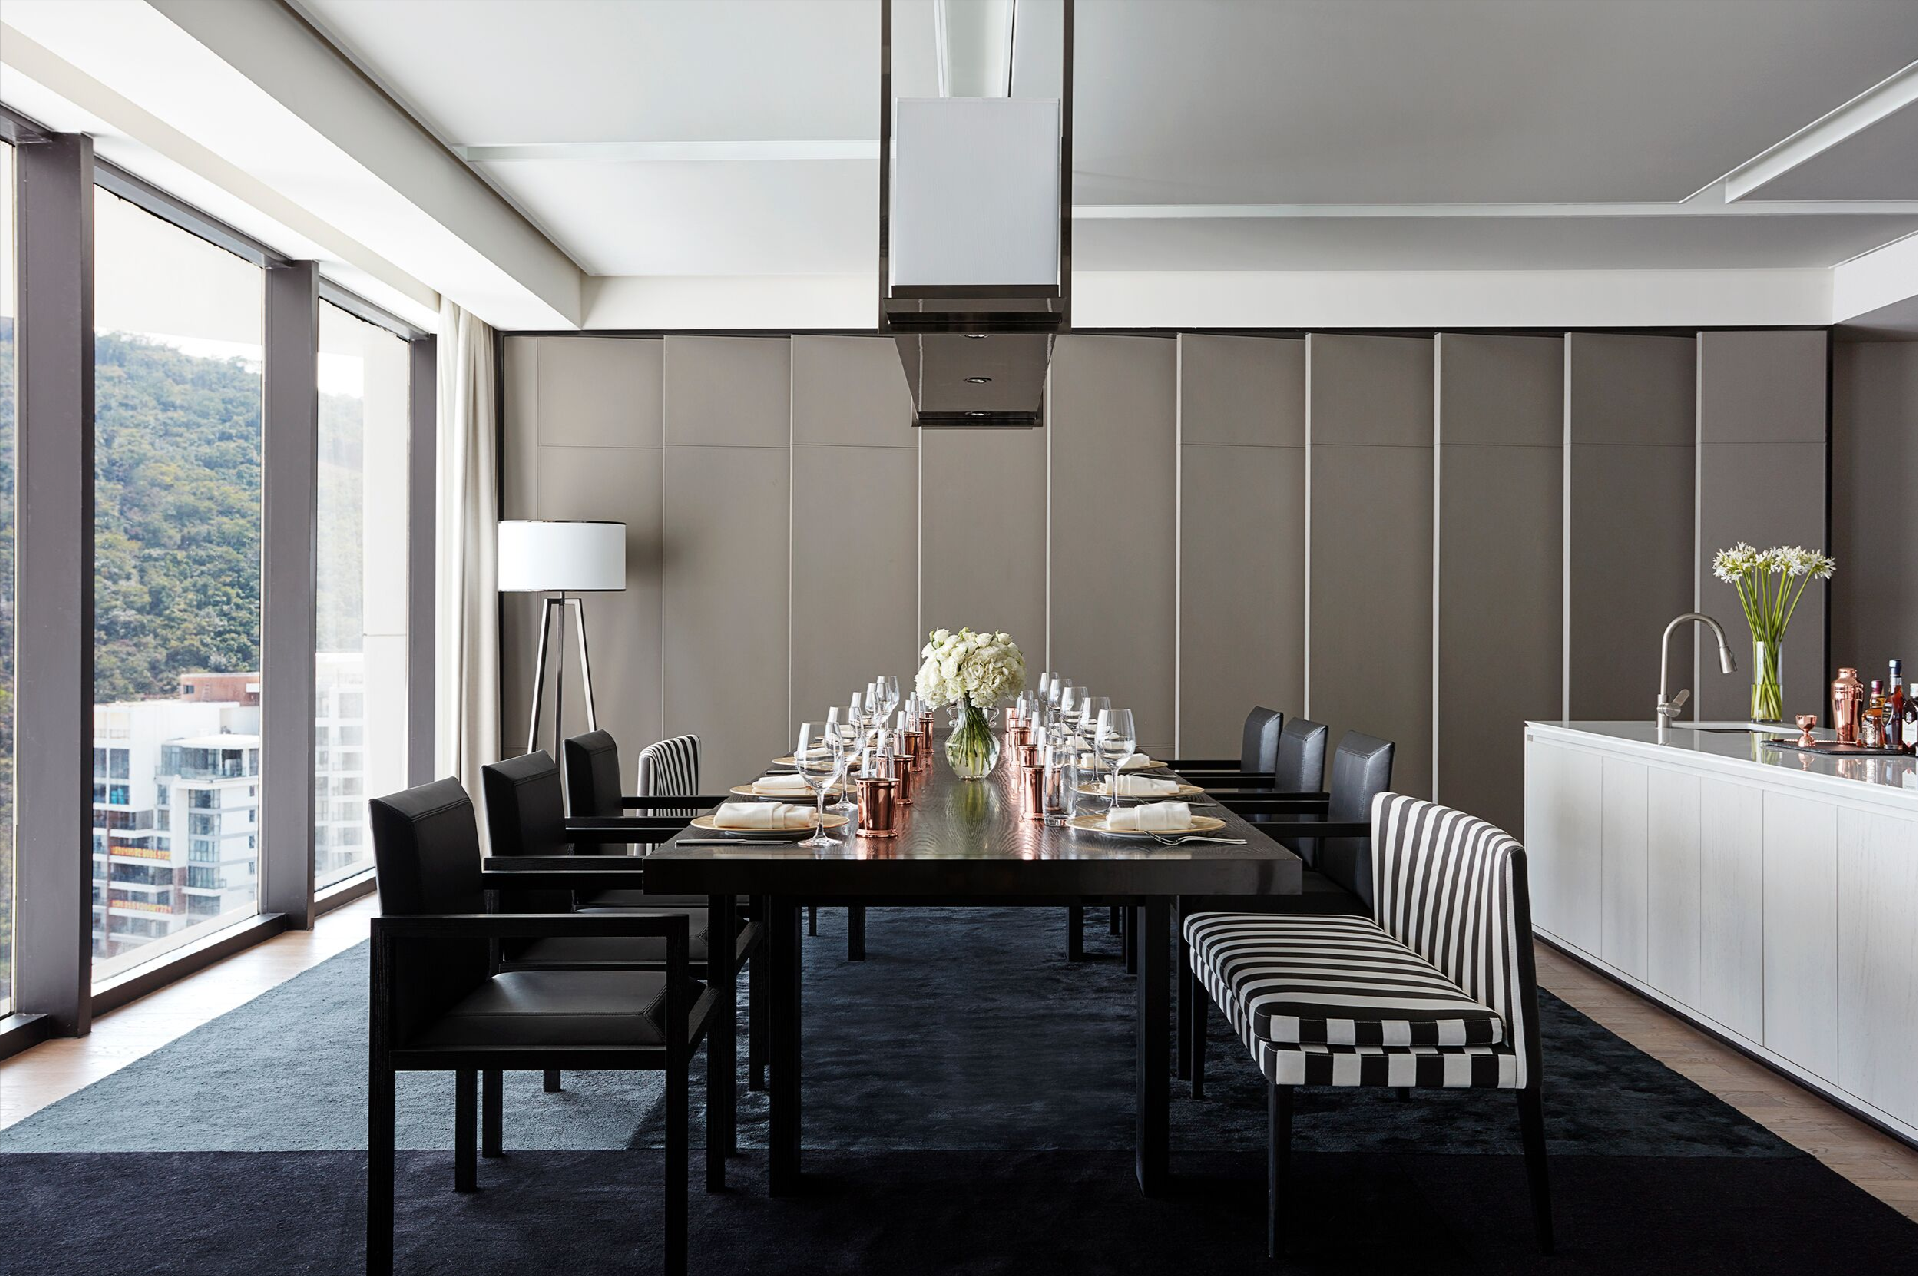 Sanya dinner party suite